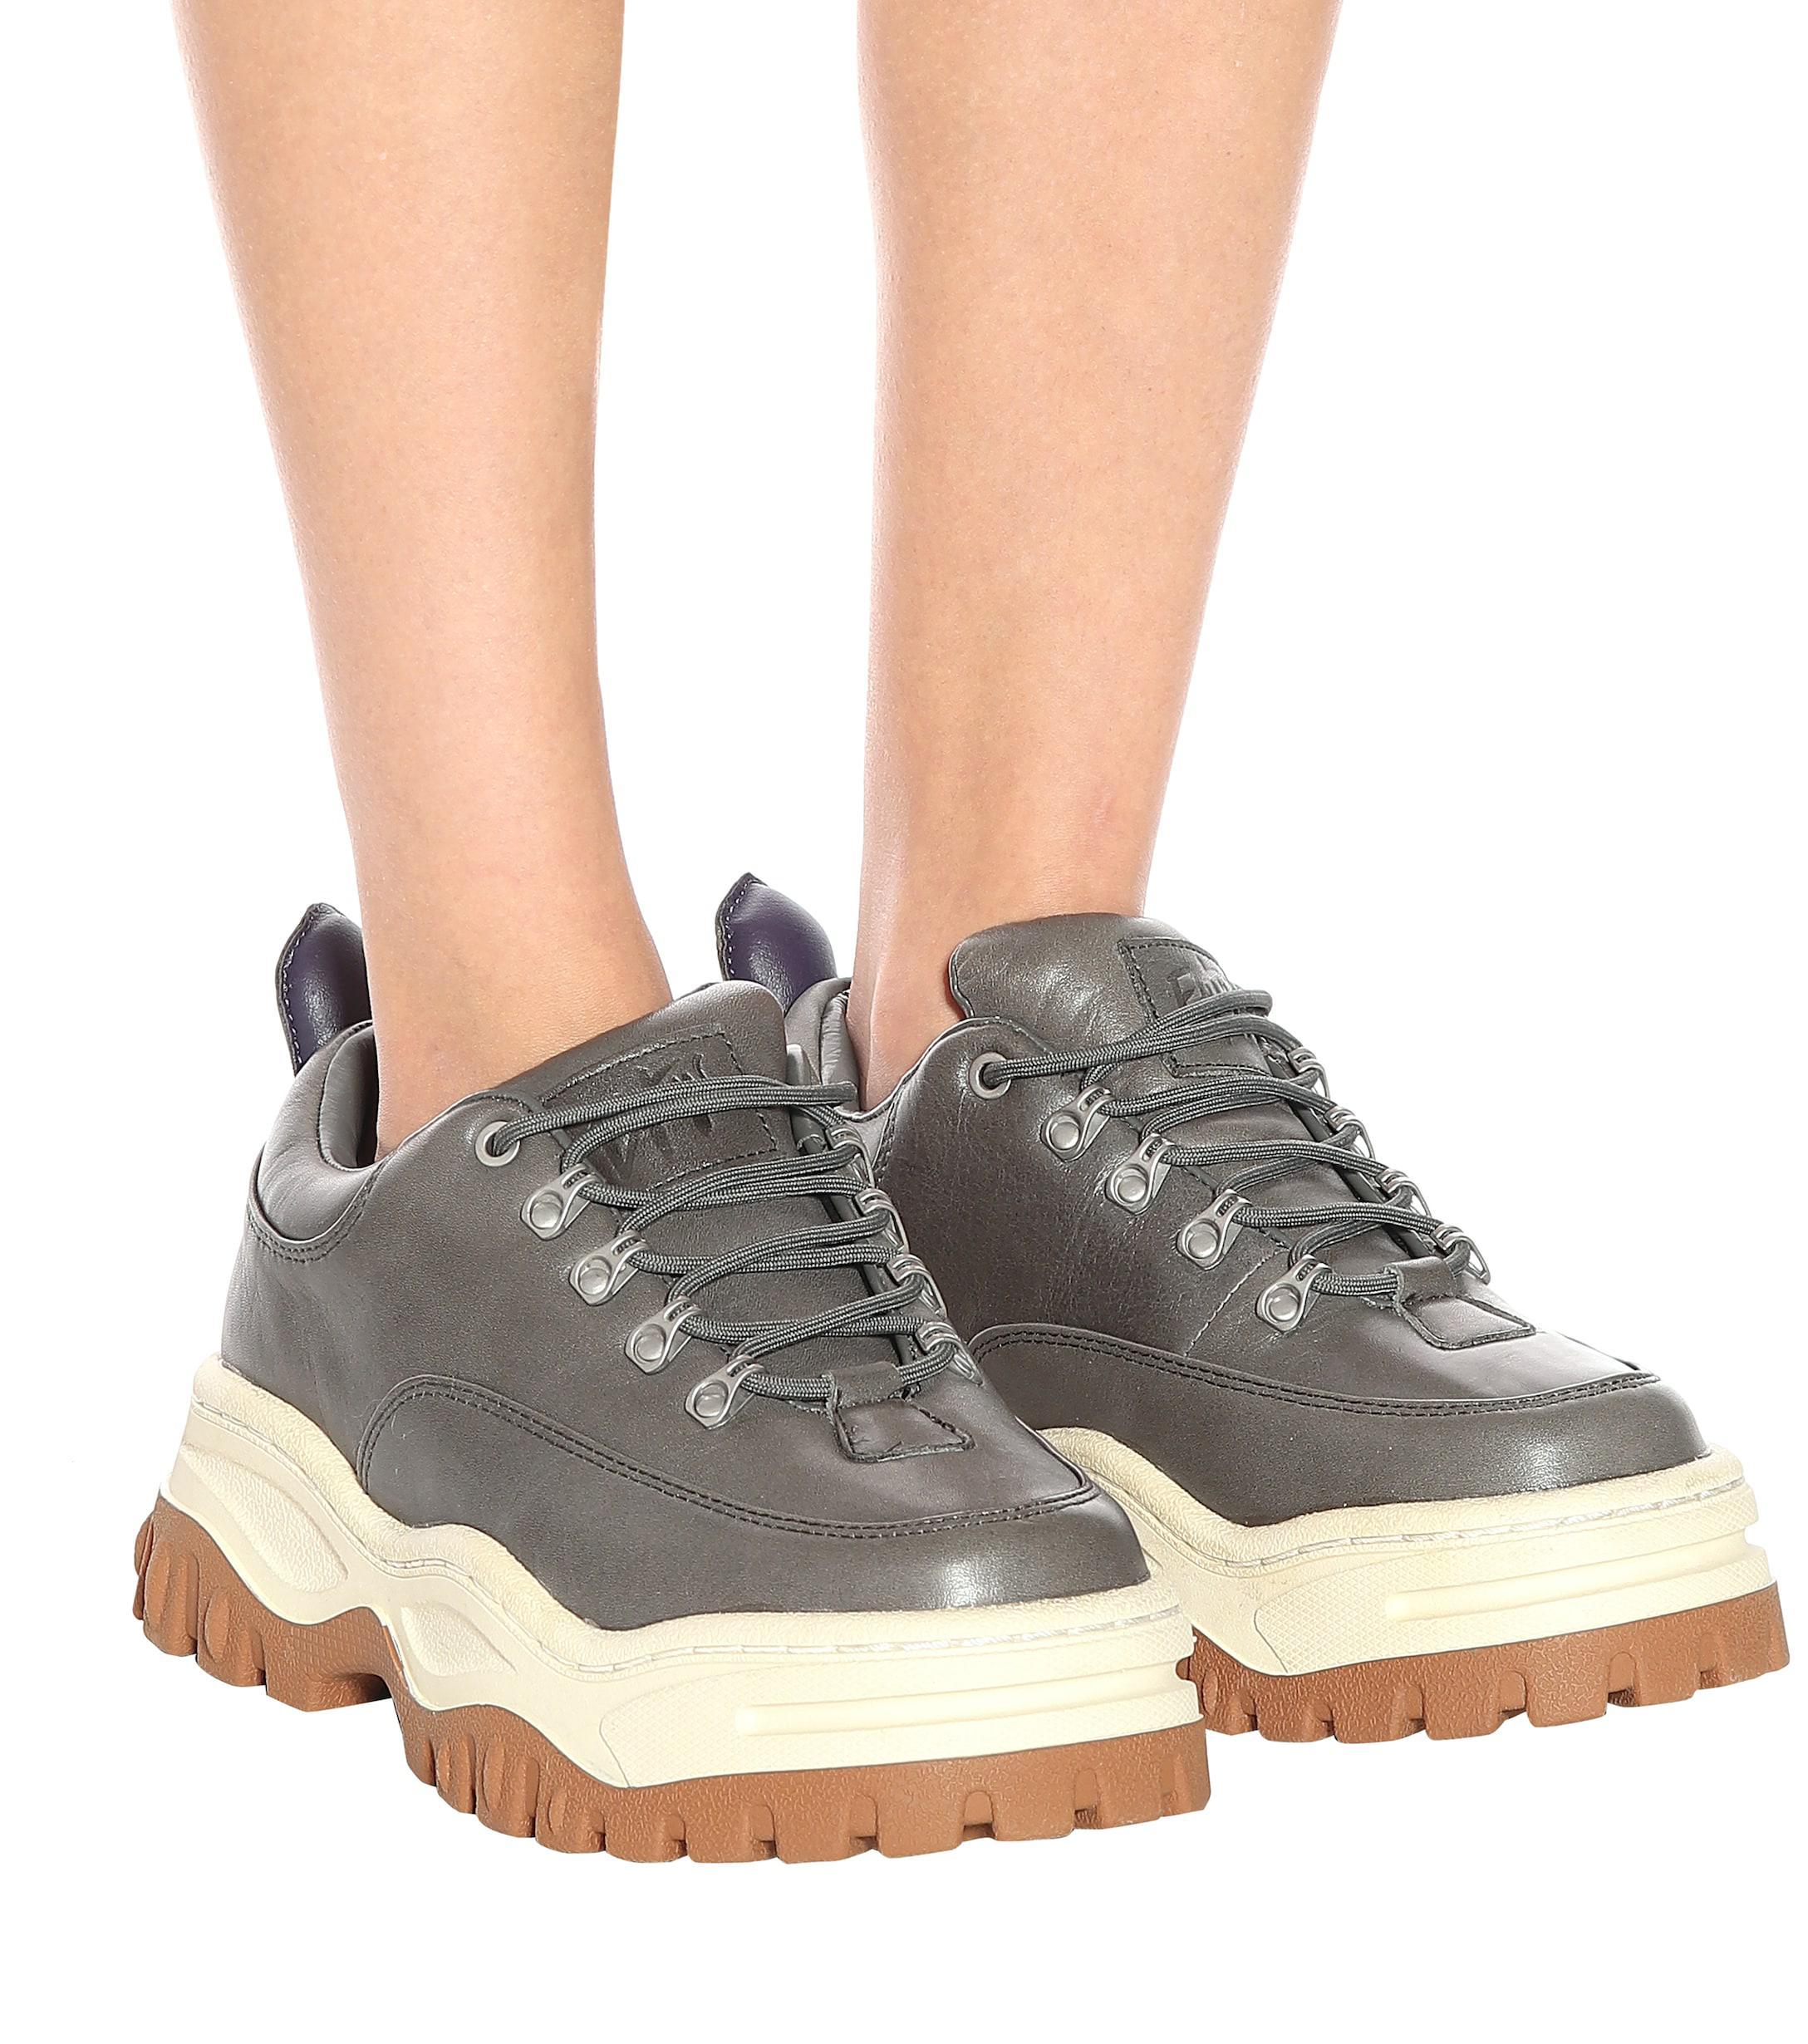 Eytys Angel Leather Sneakers in Sage